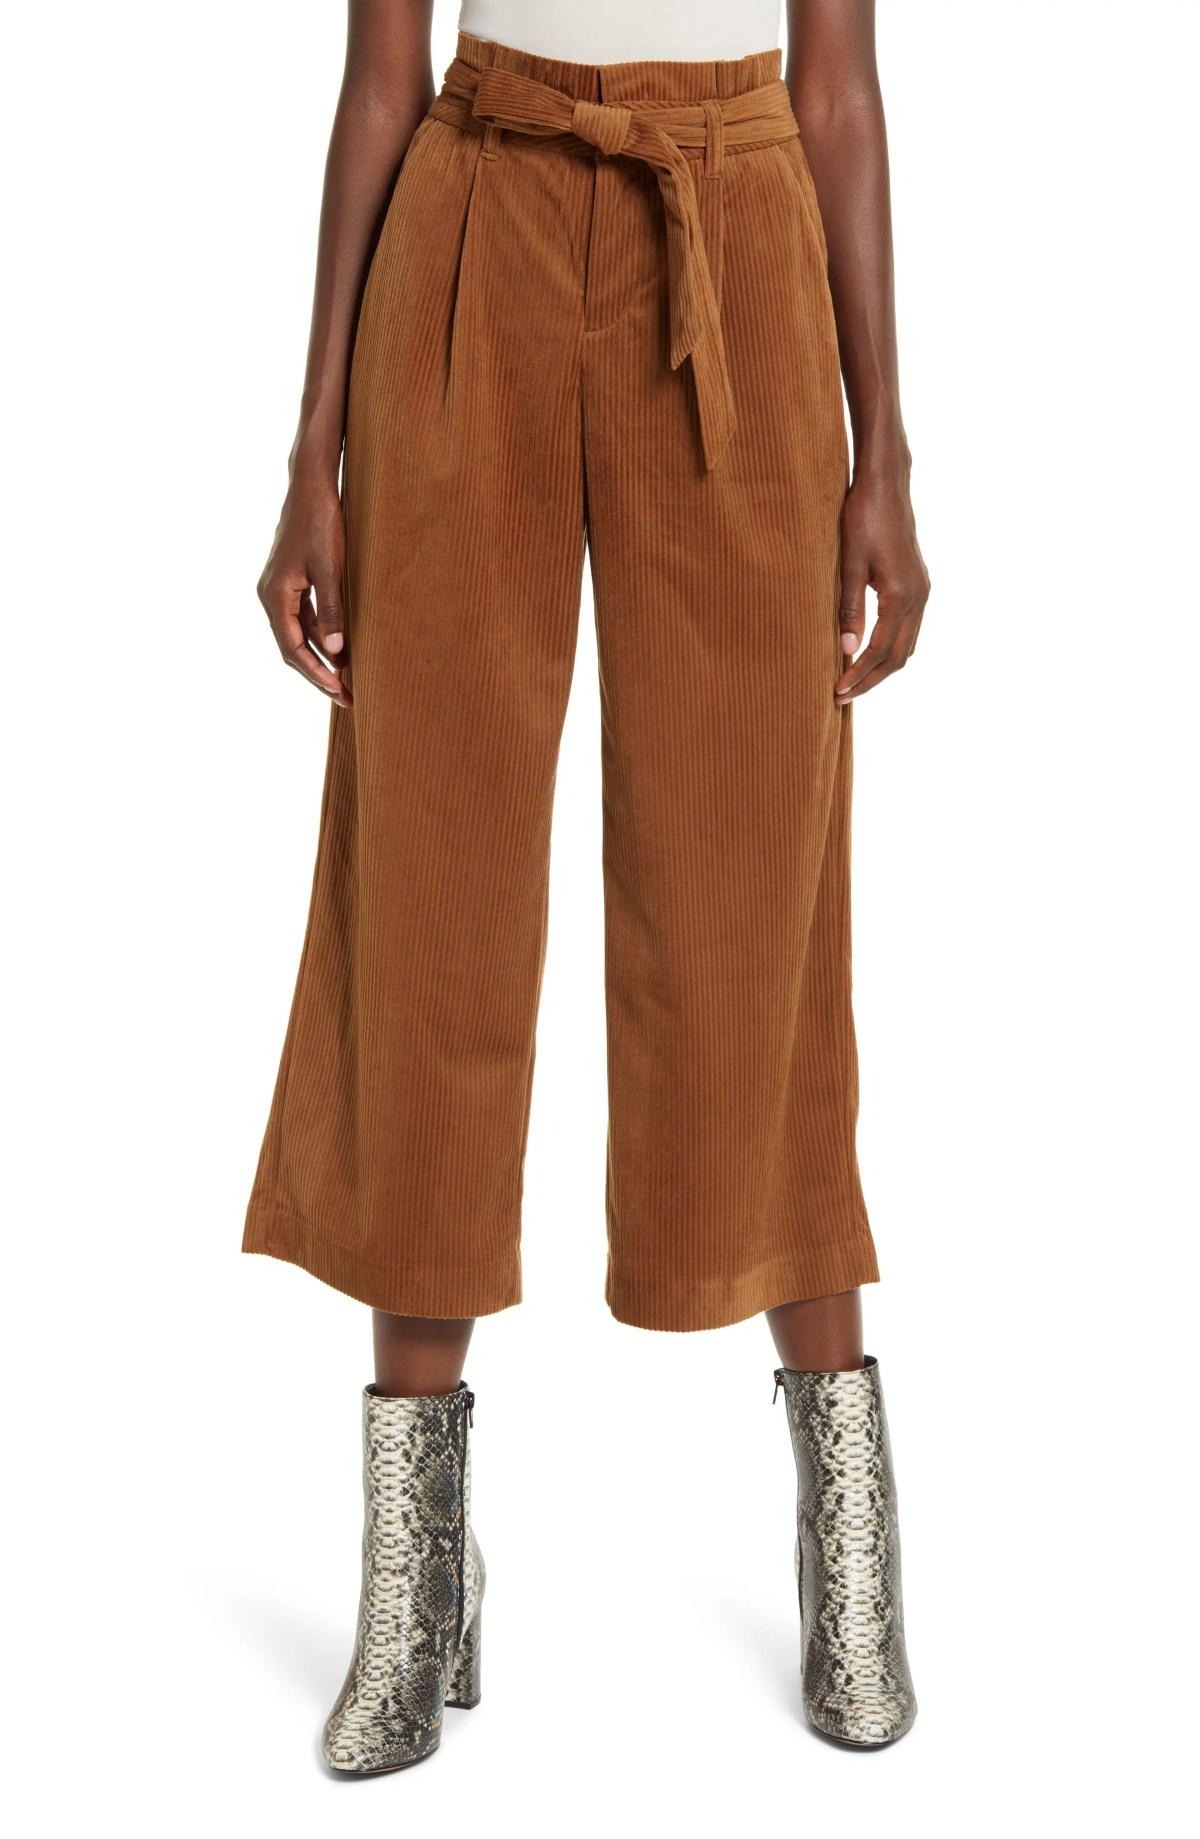 VERO MODA Londyn High Waist Corduroy Paperbag Waist Pants, Main, color, EMPERADOR